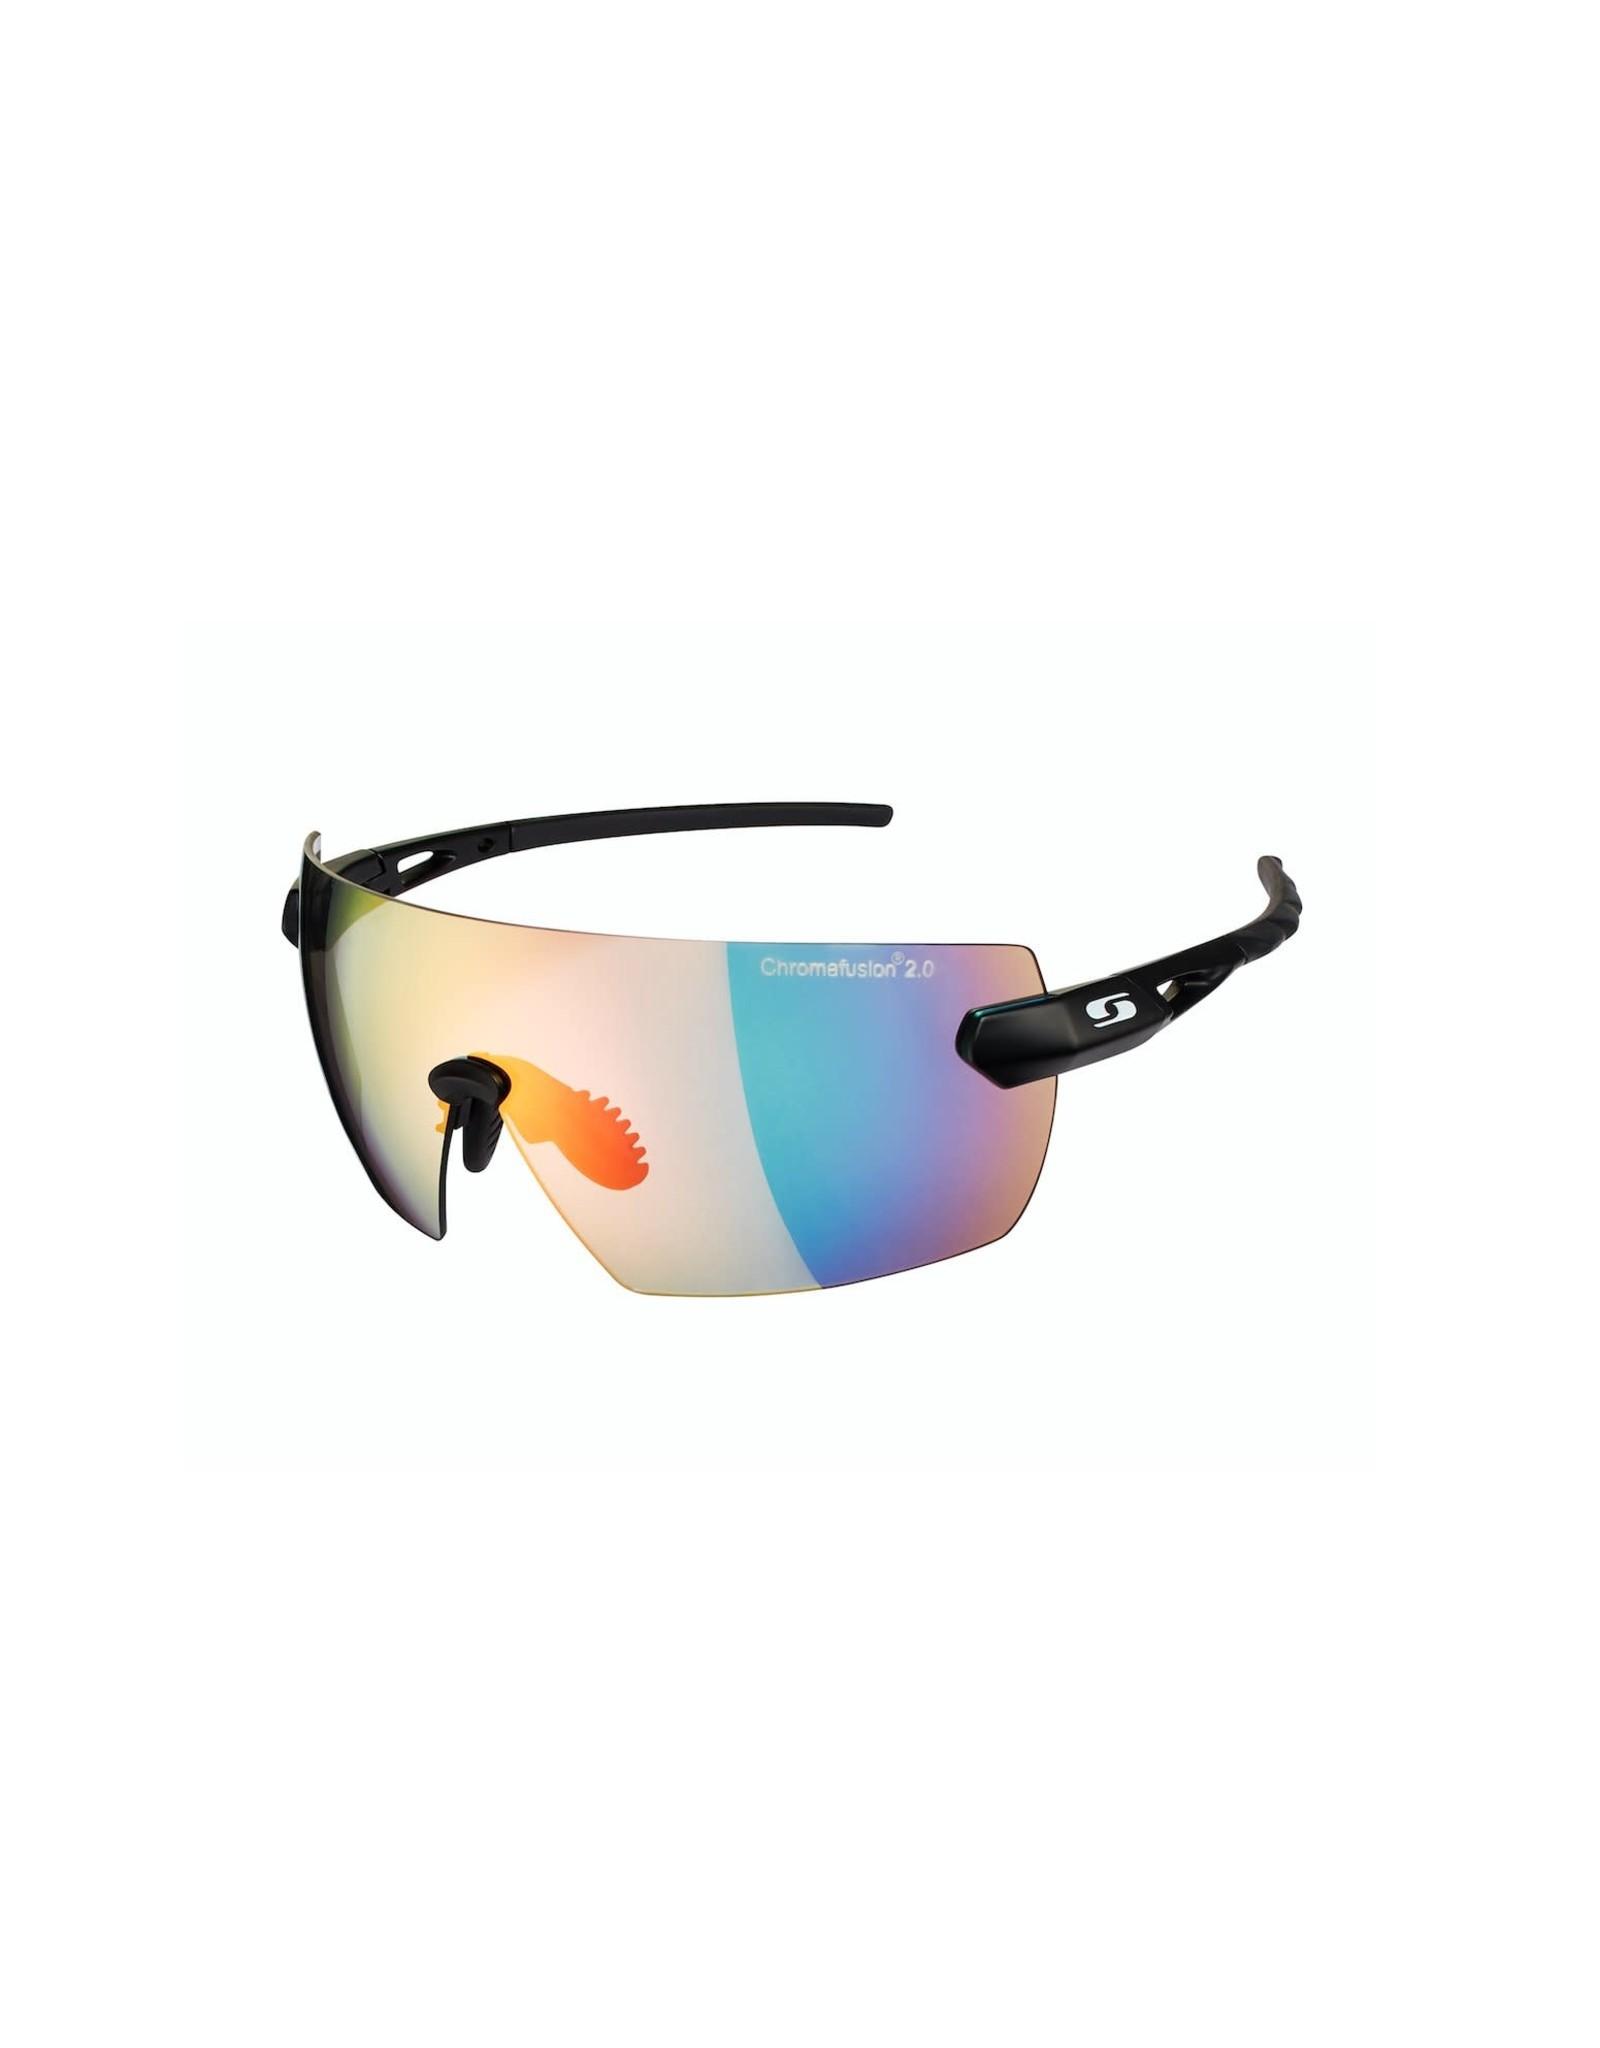 Sunwise Hastings Photochromatic Sunglasses